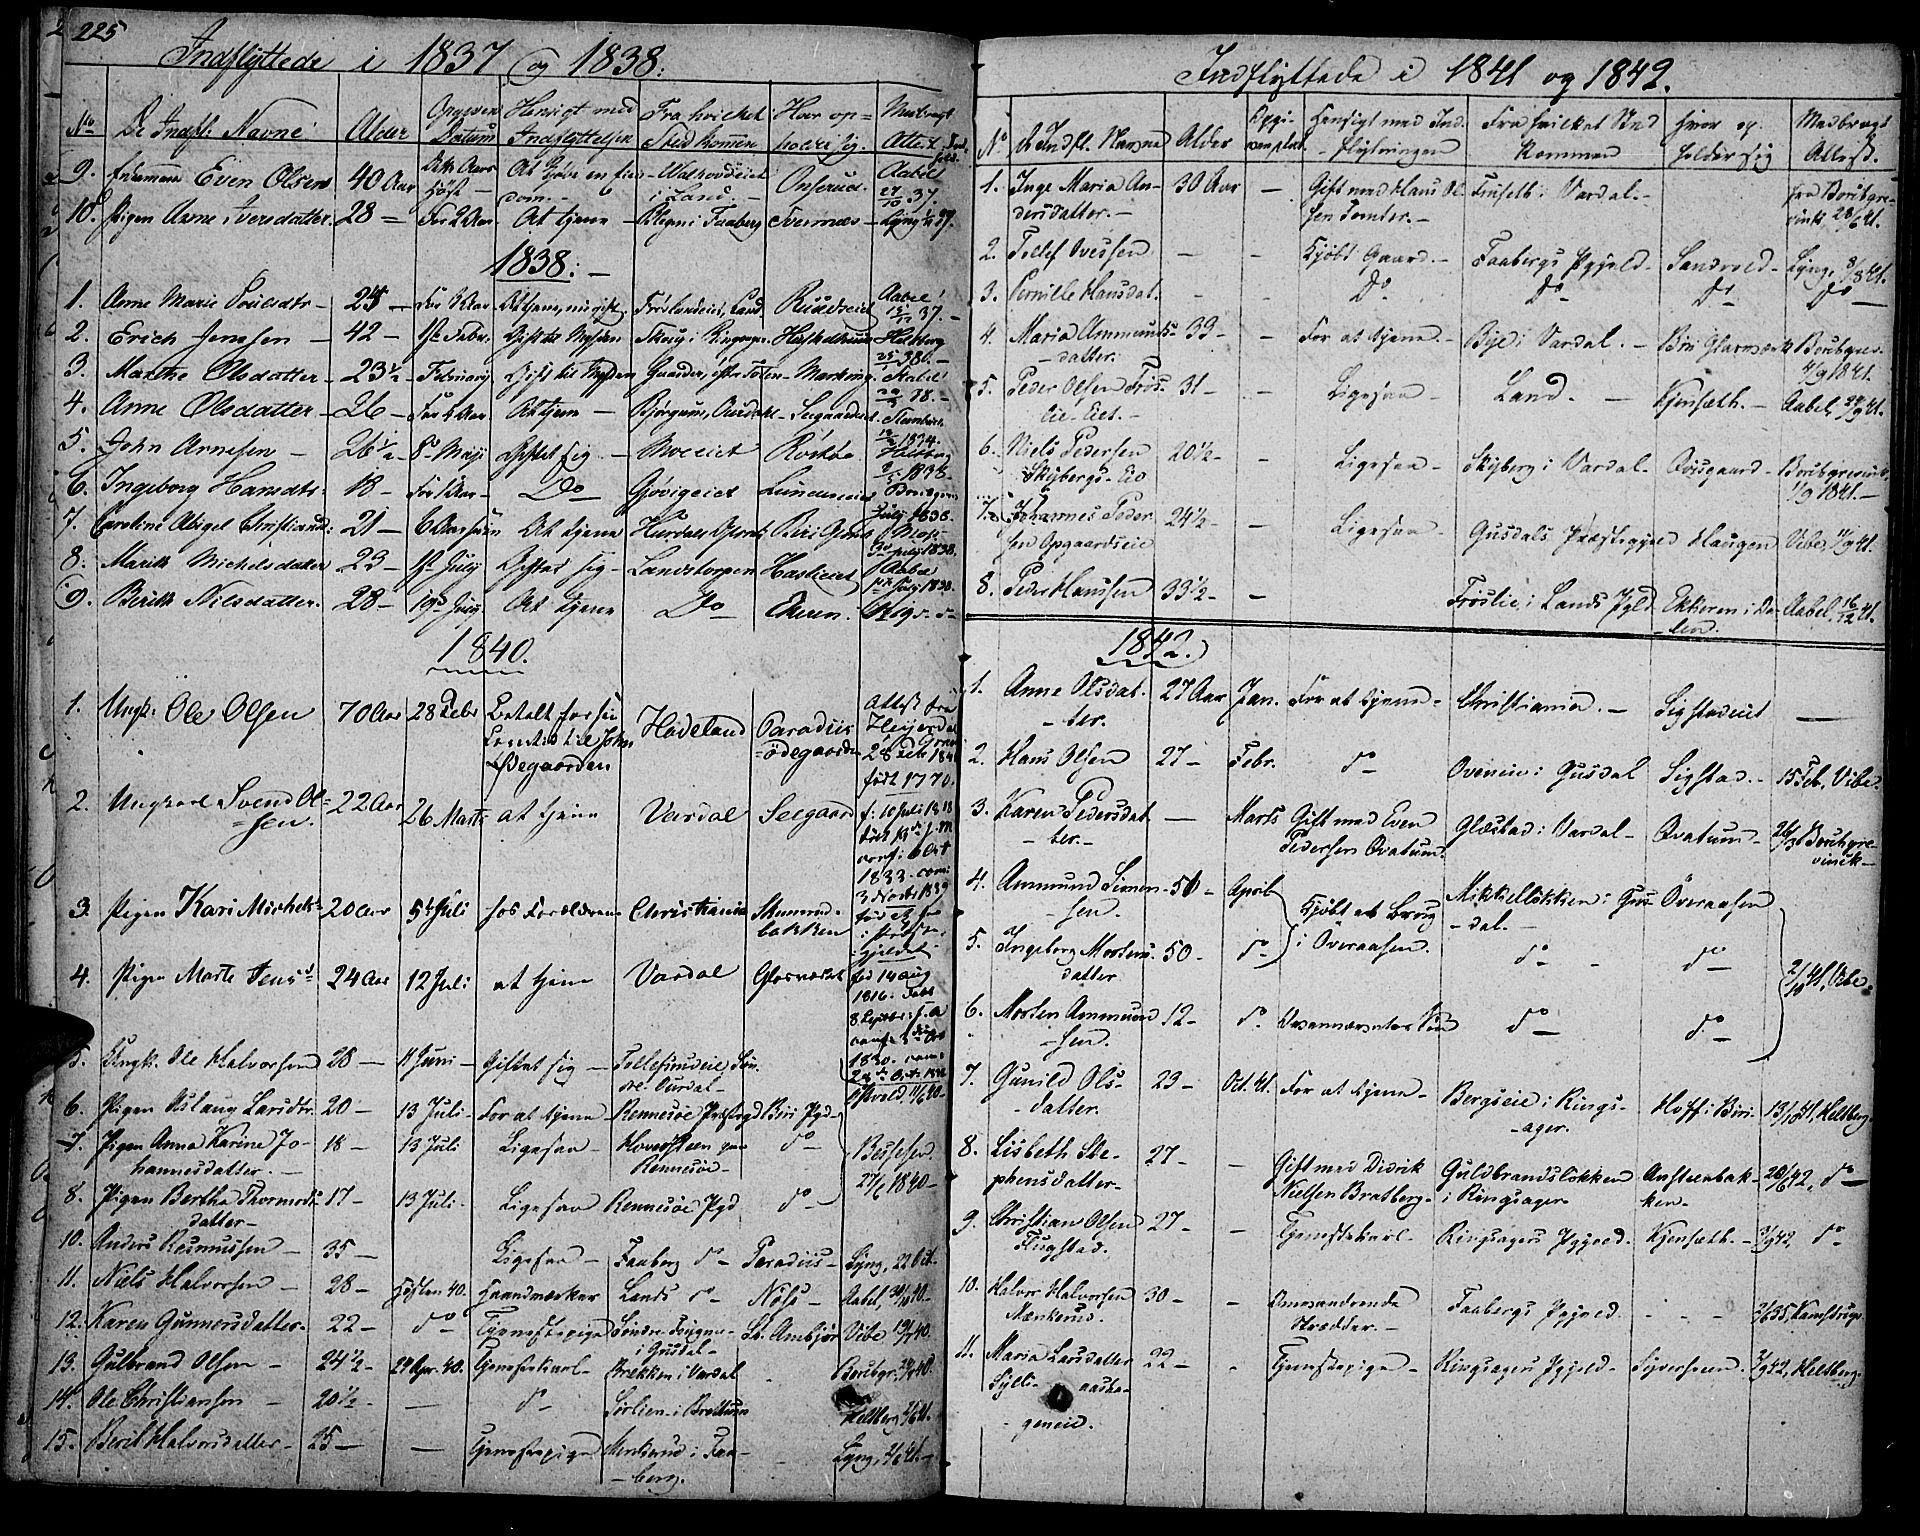 SAH, Biri prestekontor, Ministerialbok nr. 4, 1829-1842, s. 225